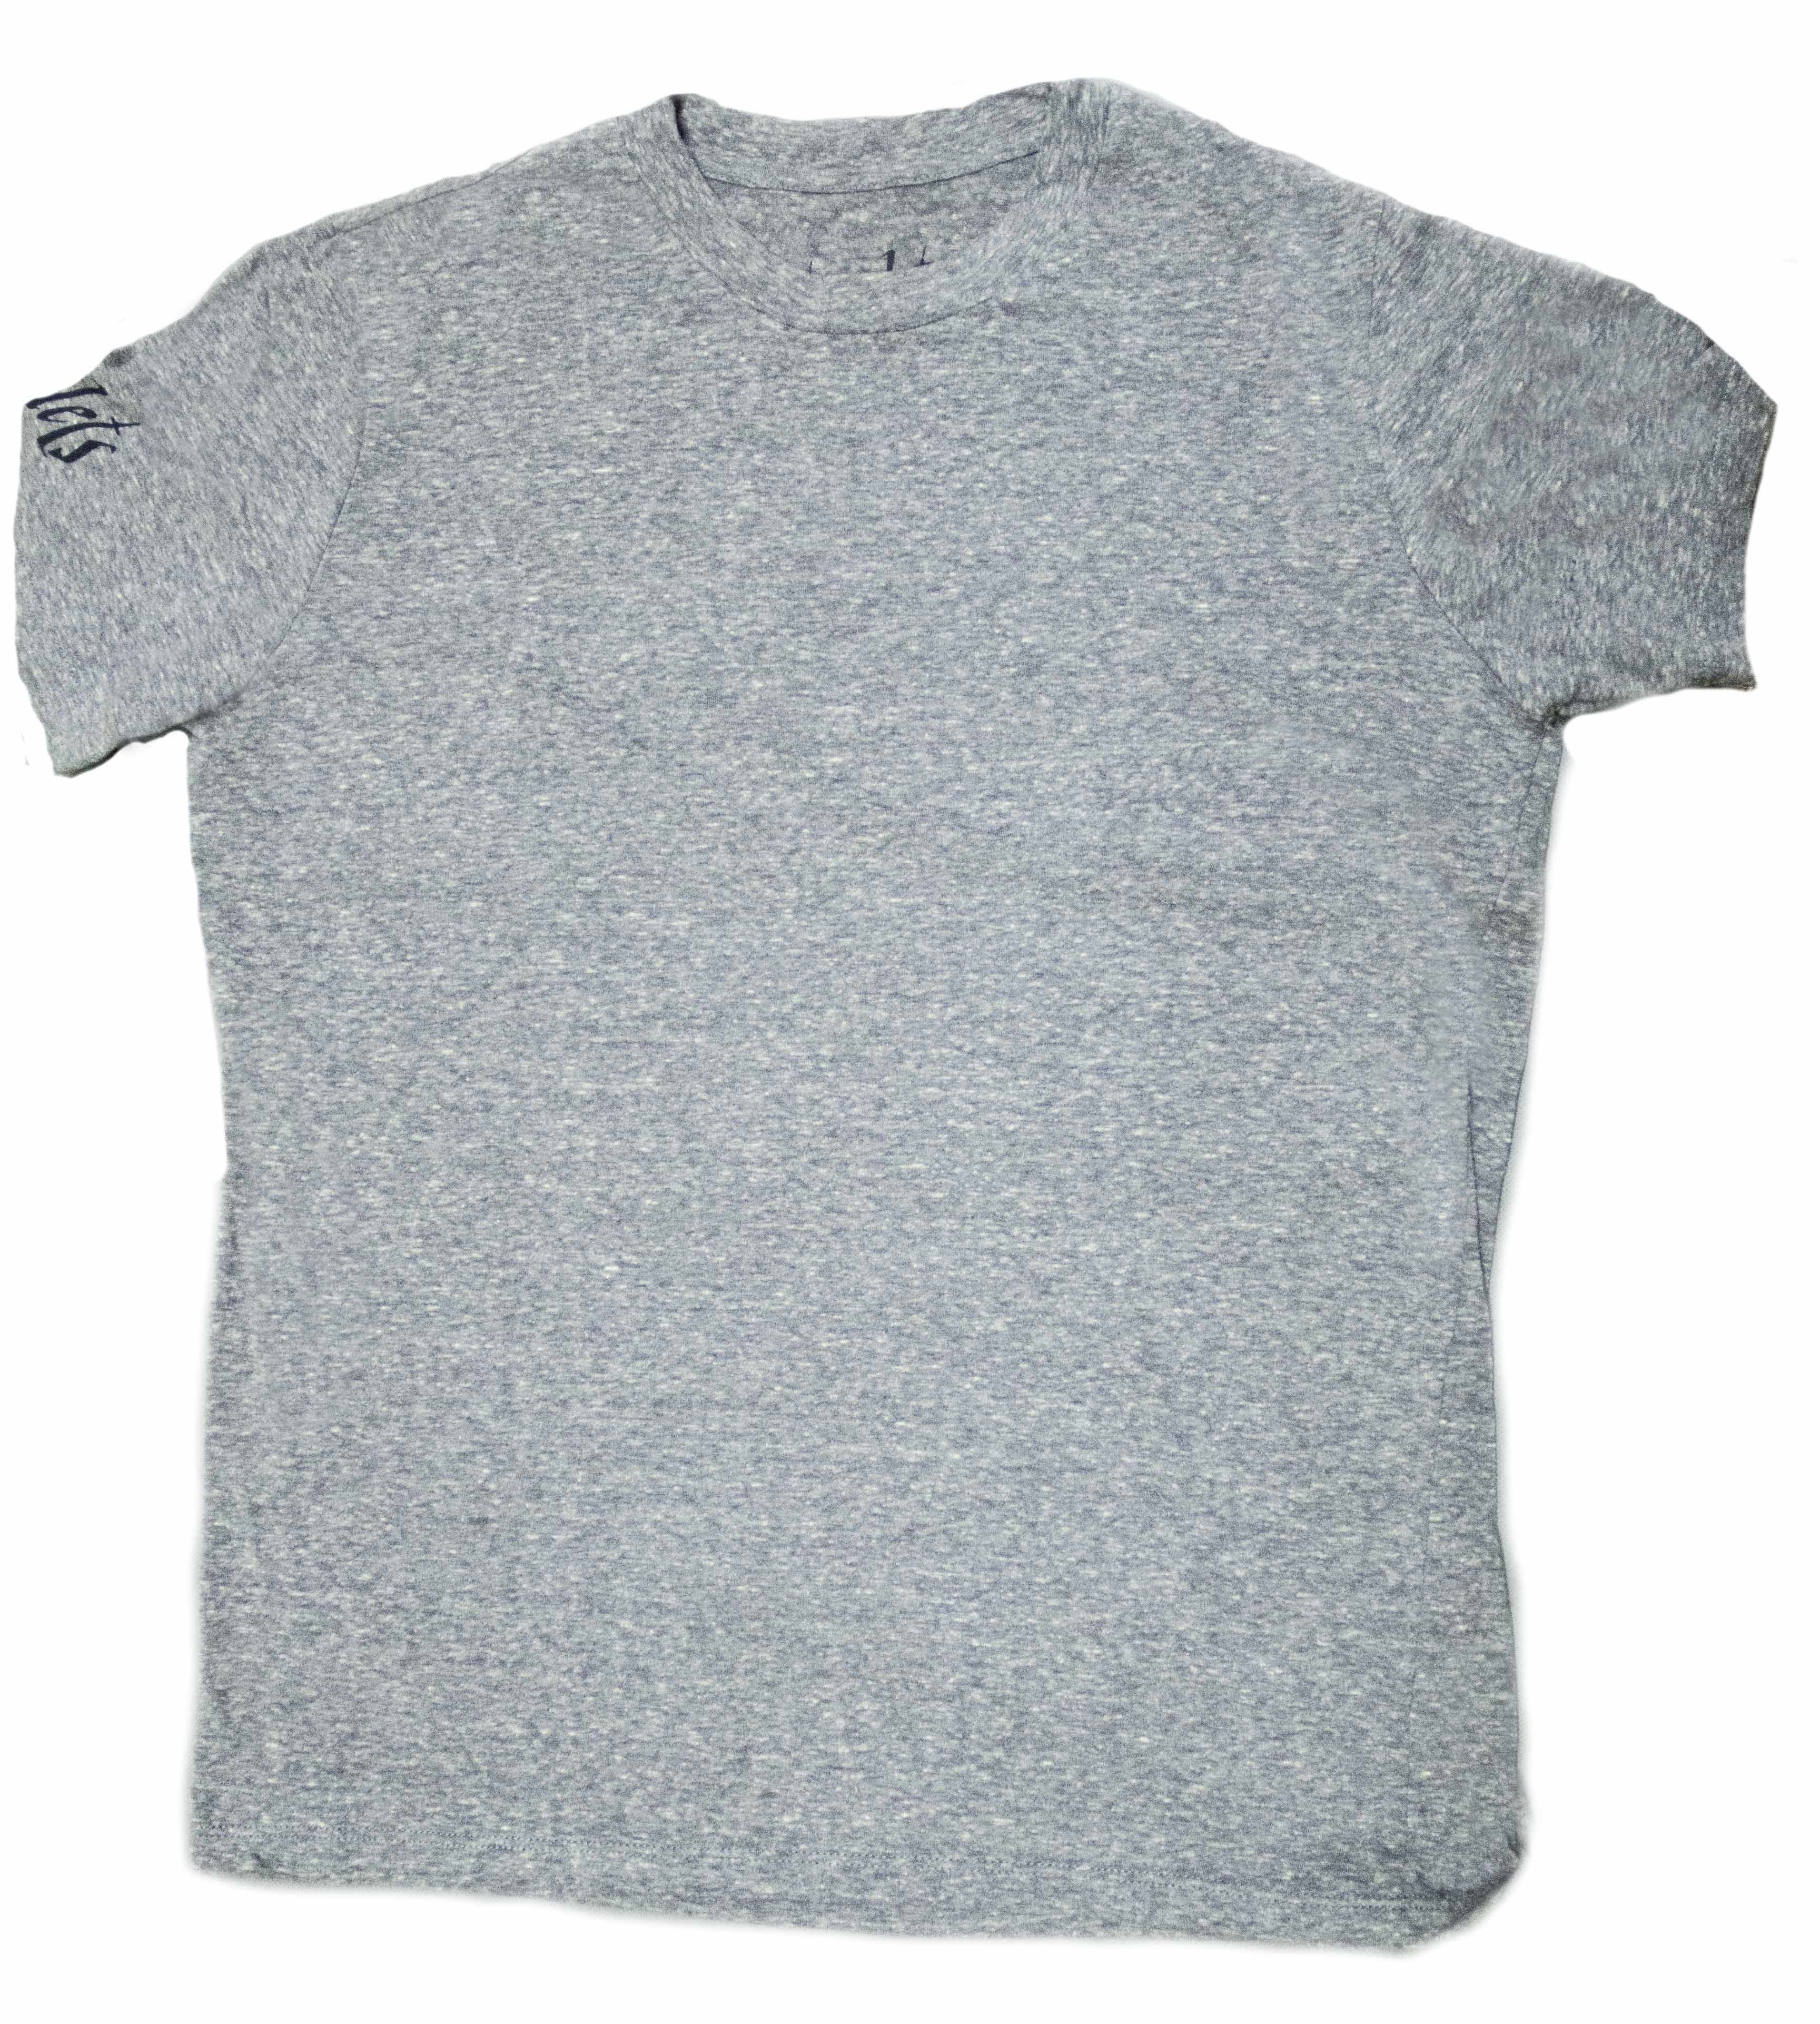 Independence Road Tour T-Shirt